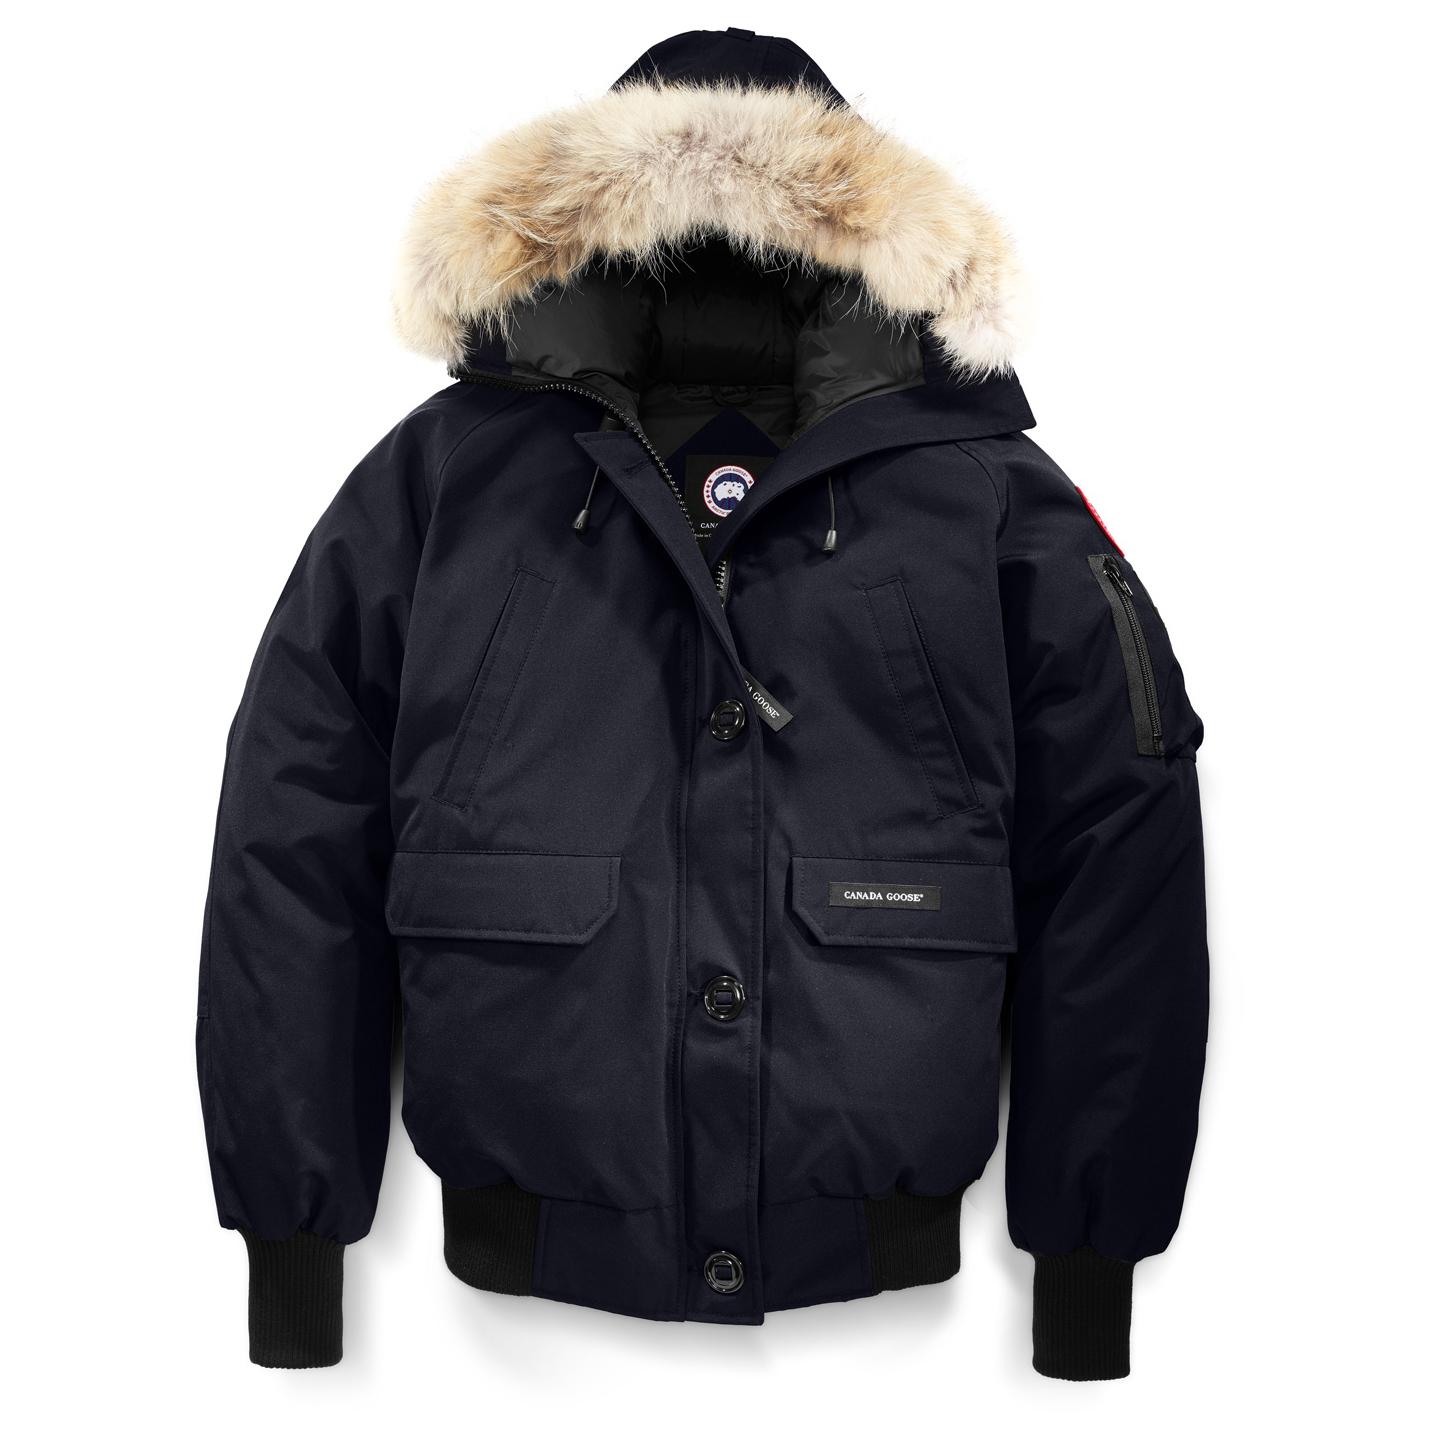 promo code 1d1d0 aa8a8 Canada Goose - Women's Chilliwack Bomber - Winterjacke - Black | XS